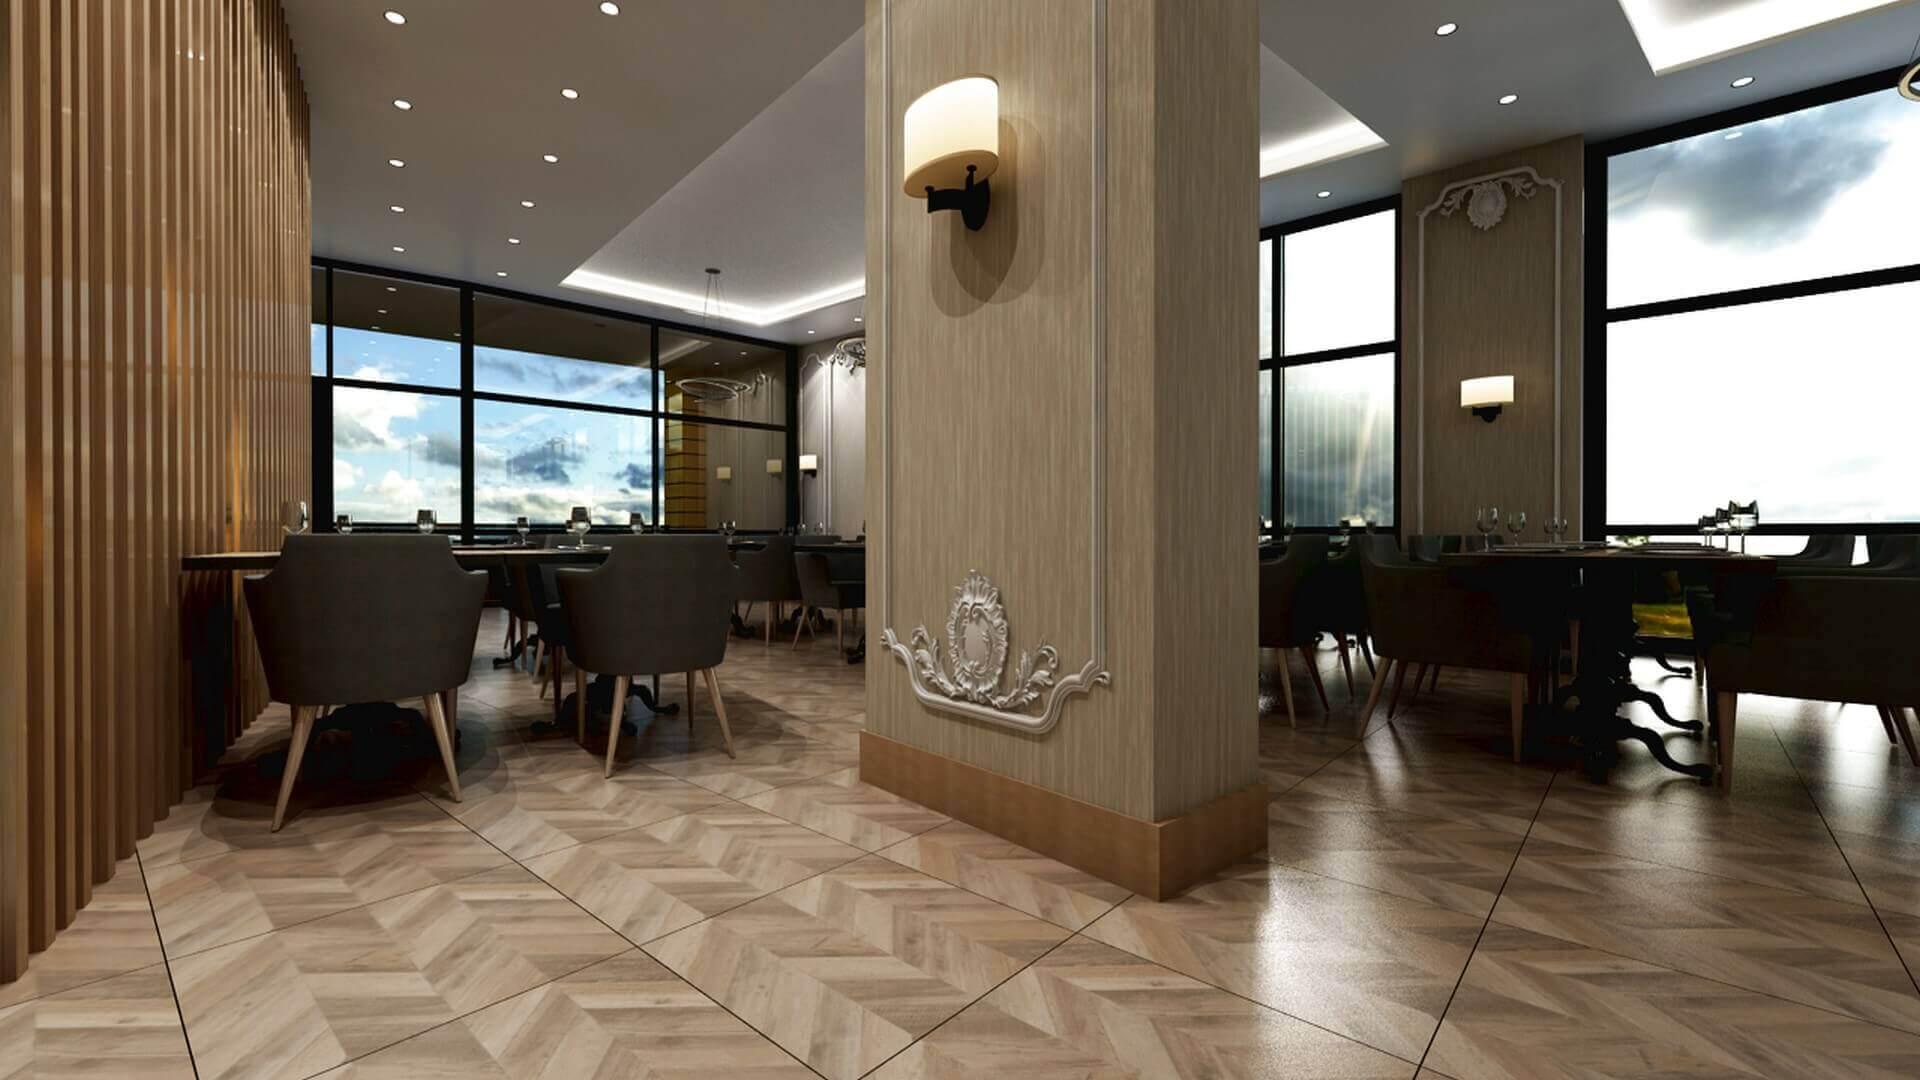 restorant iç mimar 2073 Otonomi Restoran Restoranlar